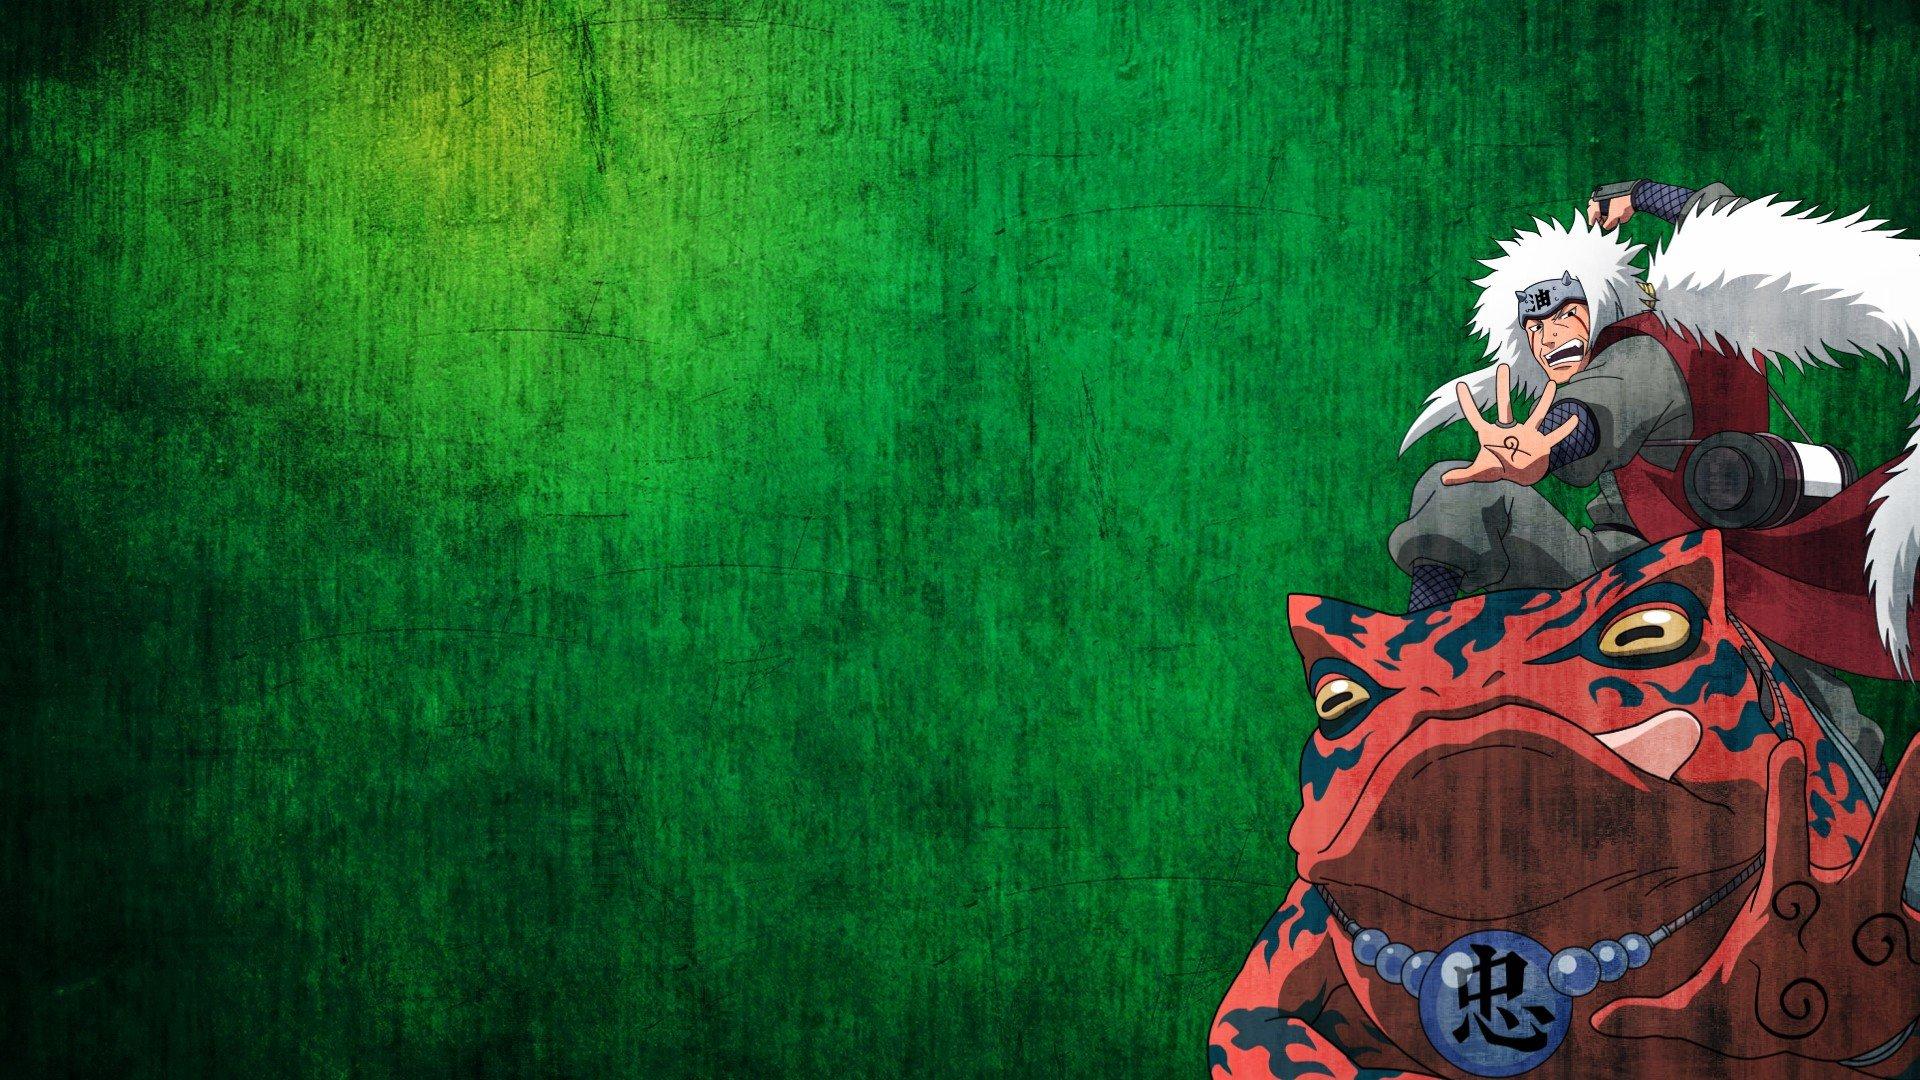 Naruto Wallpaper Hd 1366x768 Naruto Shippuden Frogs Anime Anime Boys Jiraiya Green